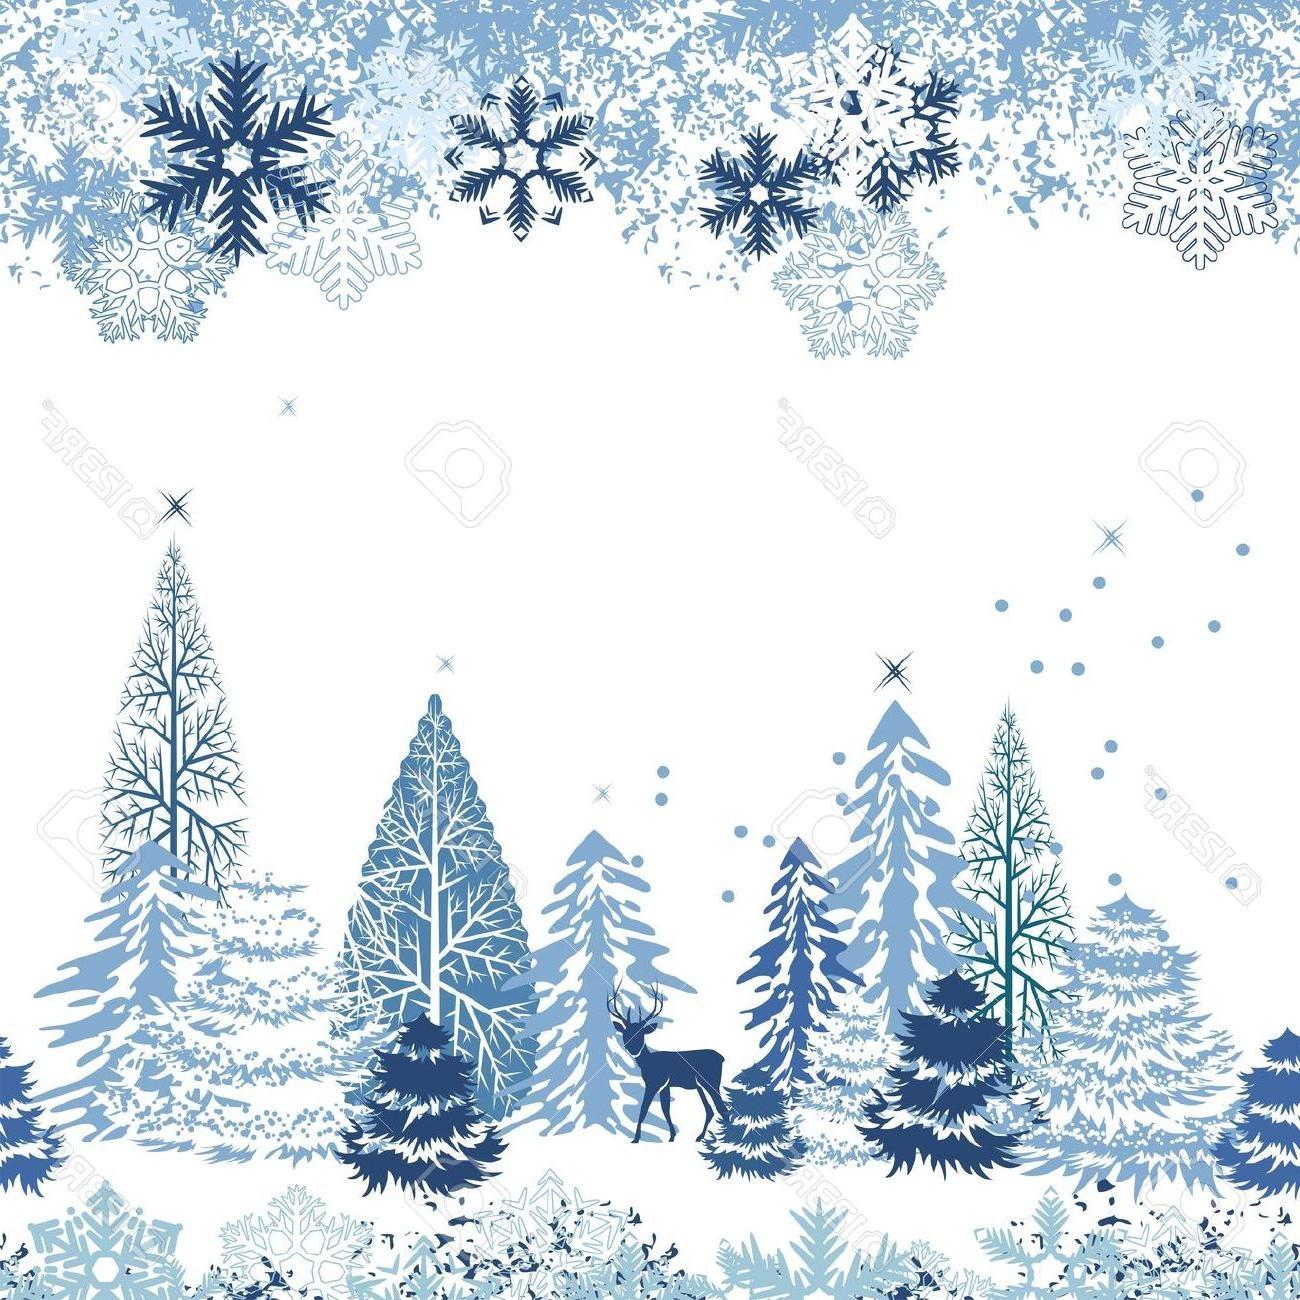 Winter border clipart Inspirational HD Winter Border Clip Art File.